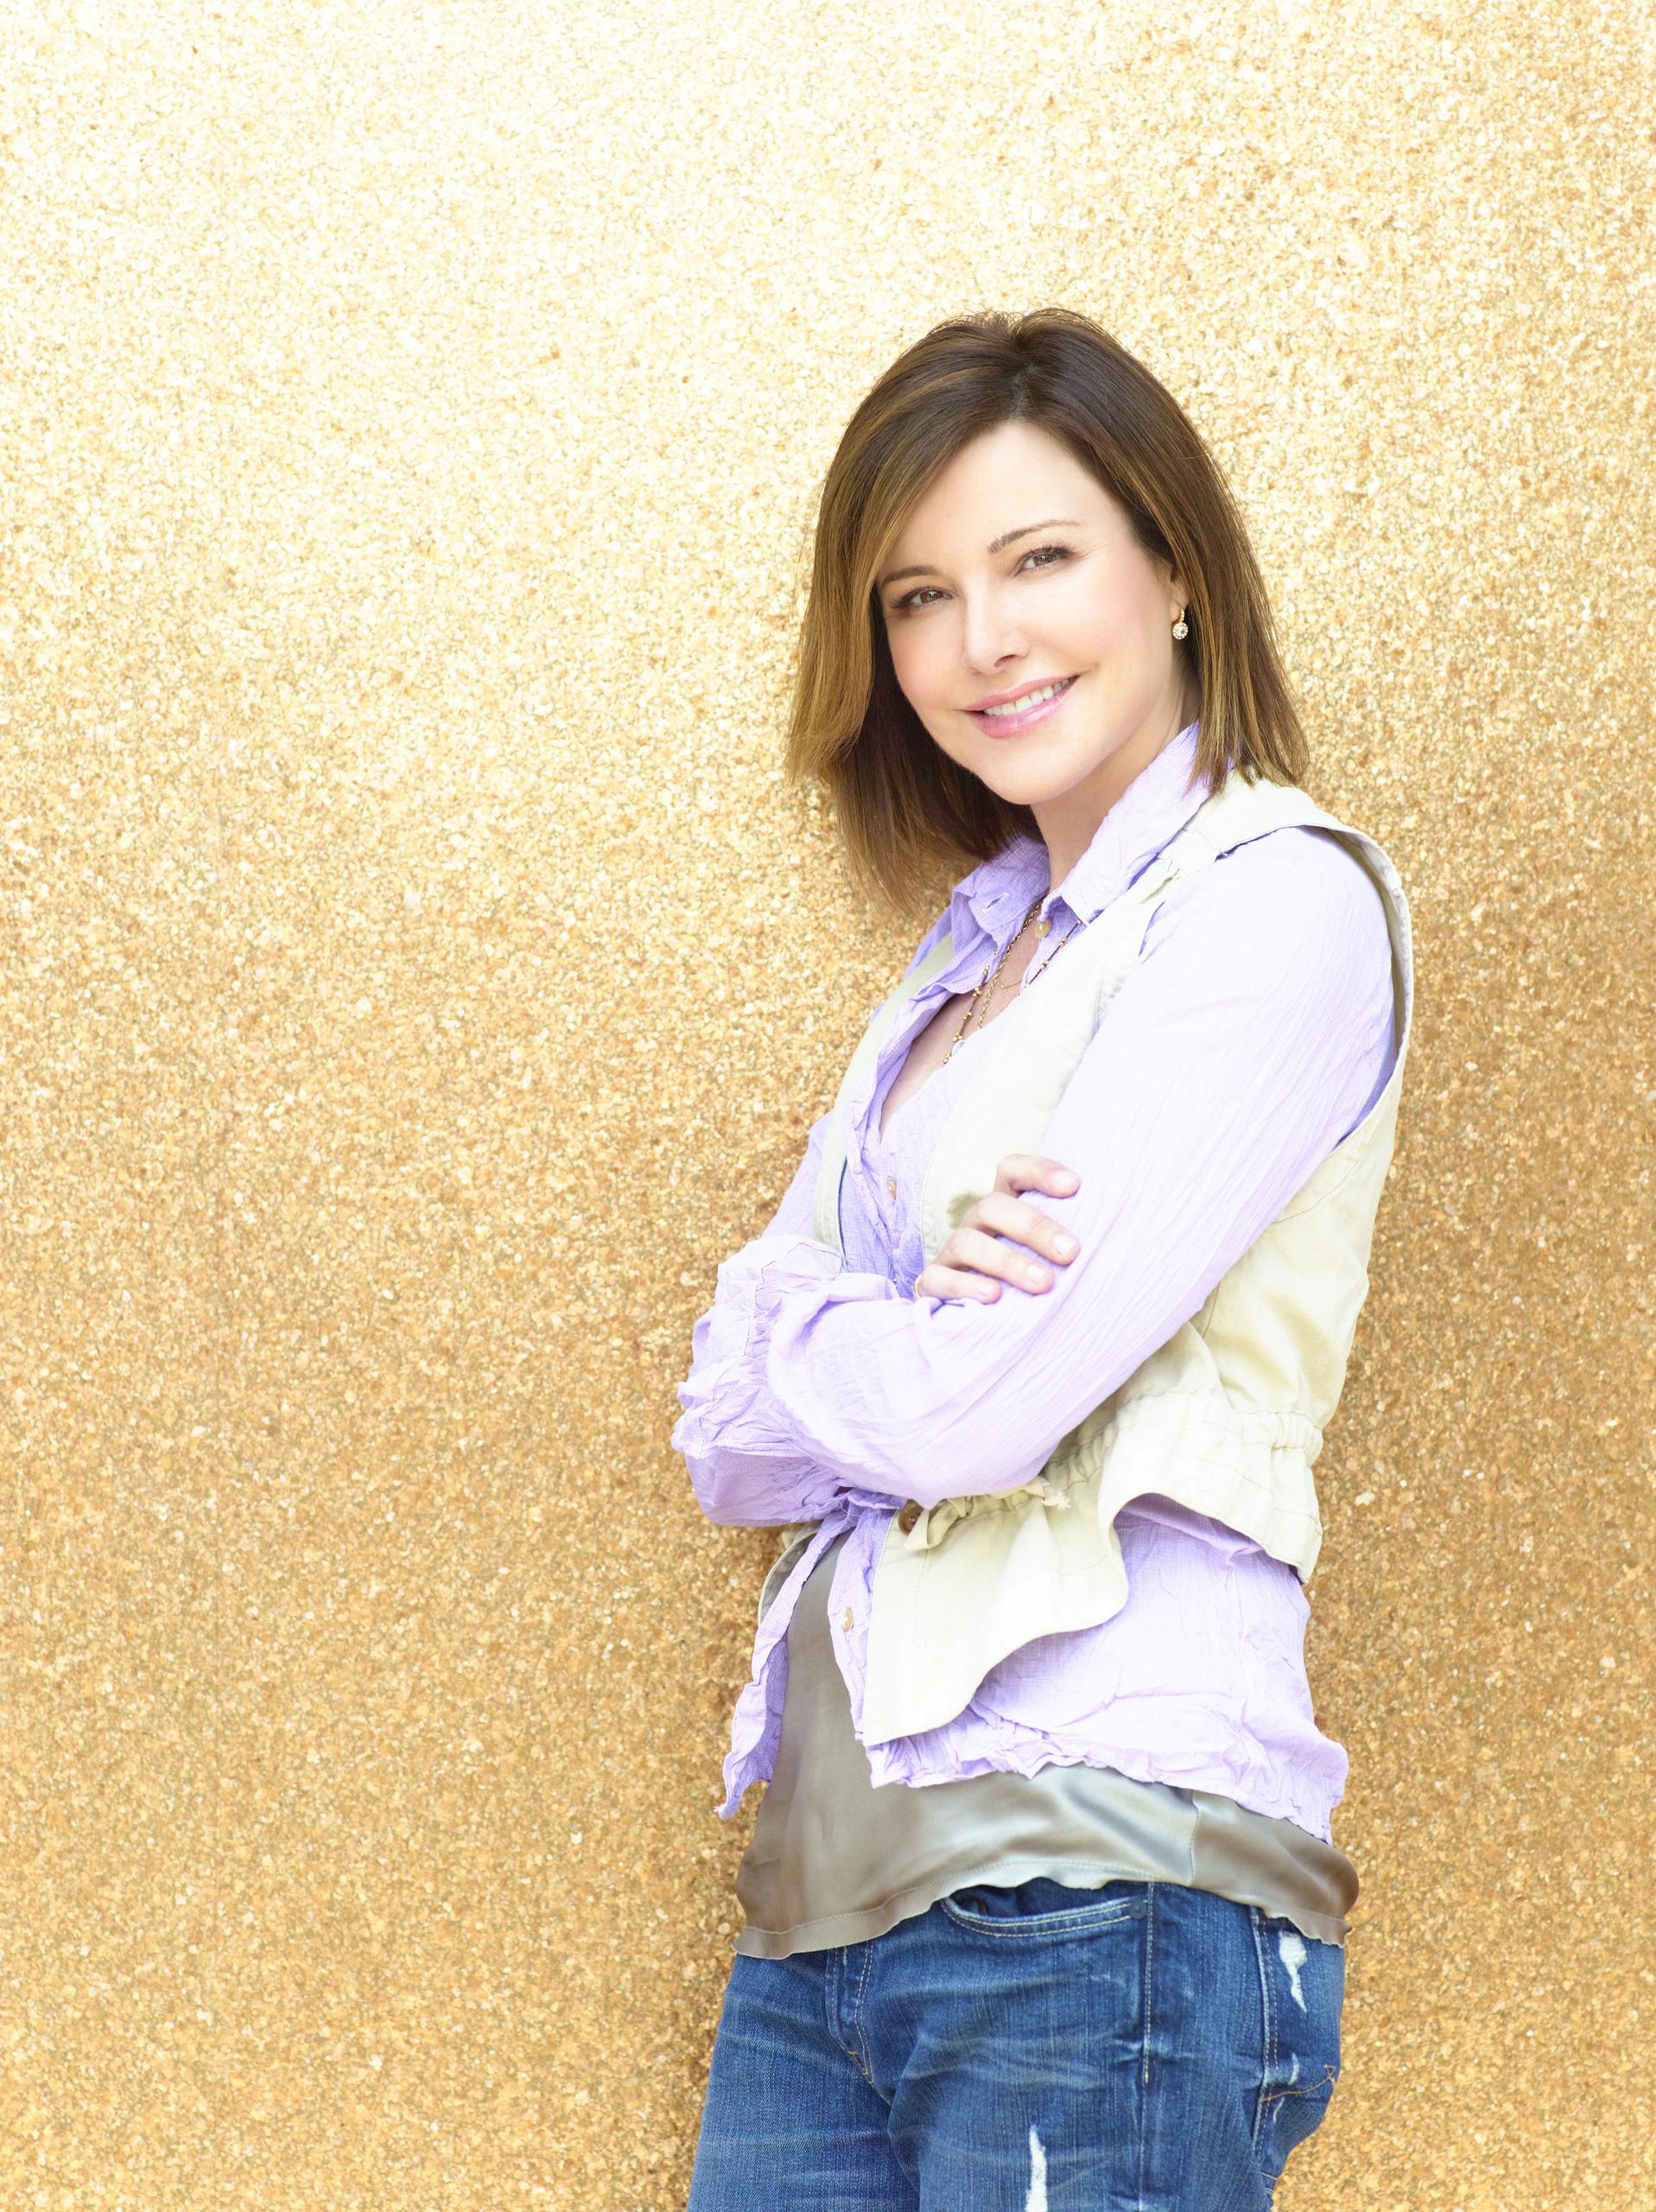 Christa Miller As Ellie.